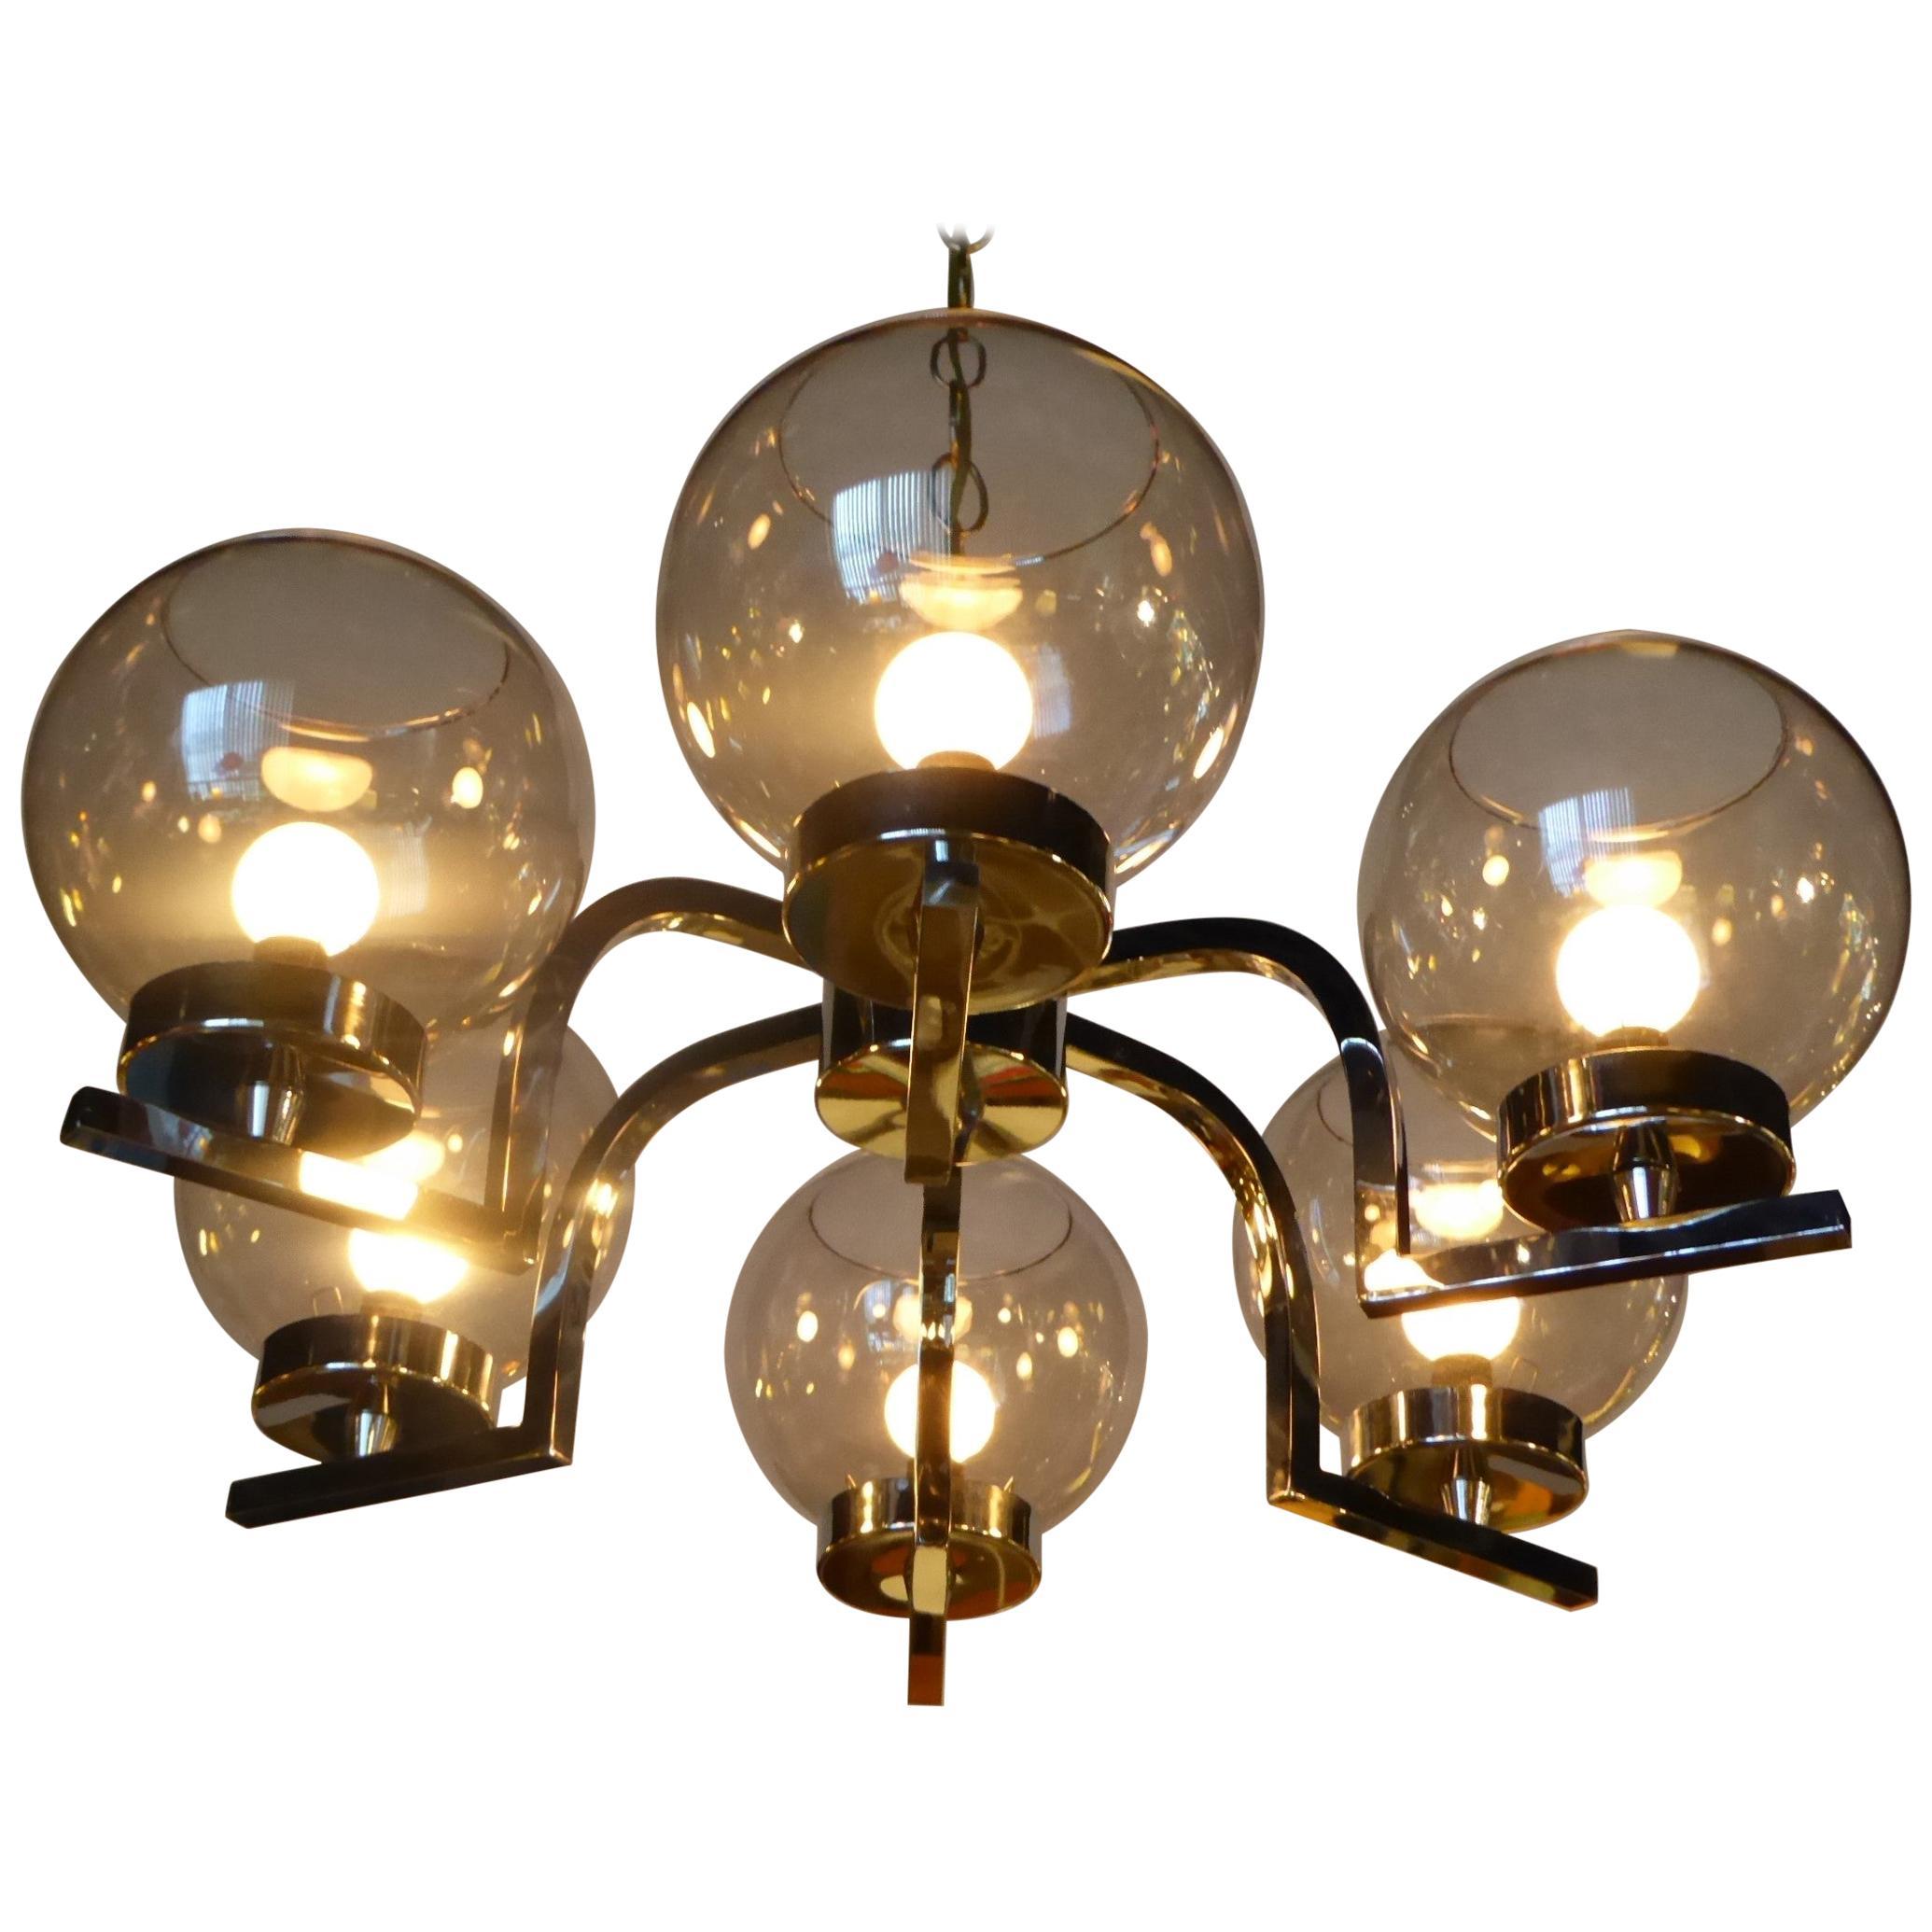 1960s Chrome and Smoked Glass Ball Globe Six-Light Chandelier